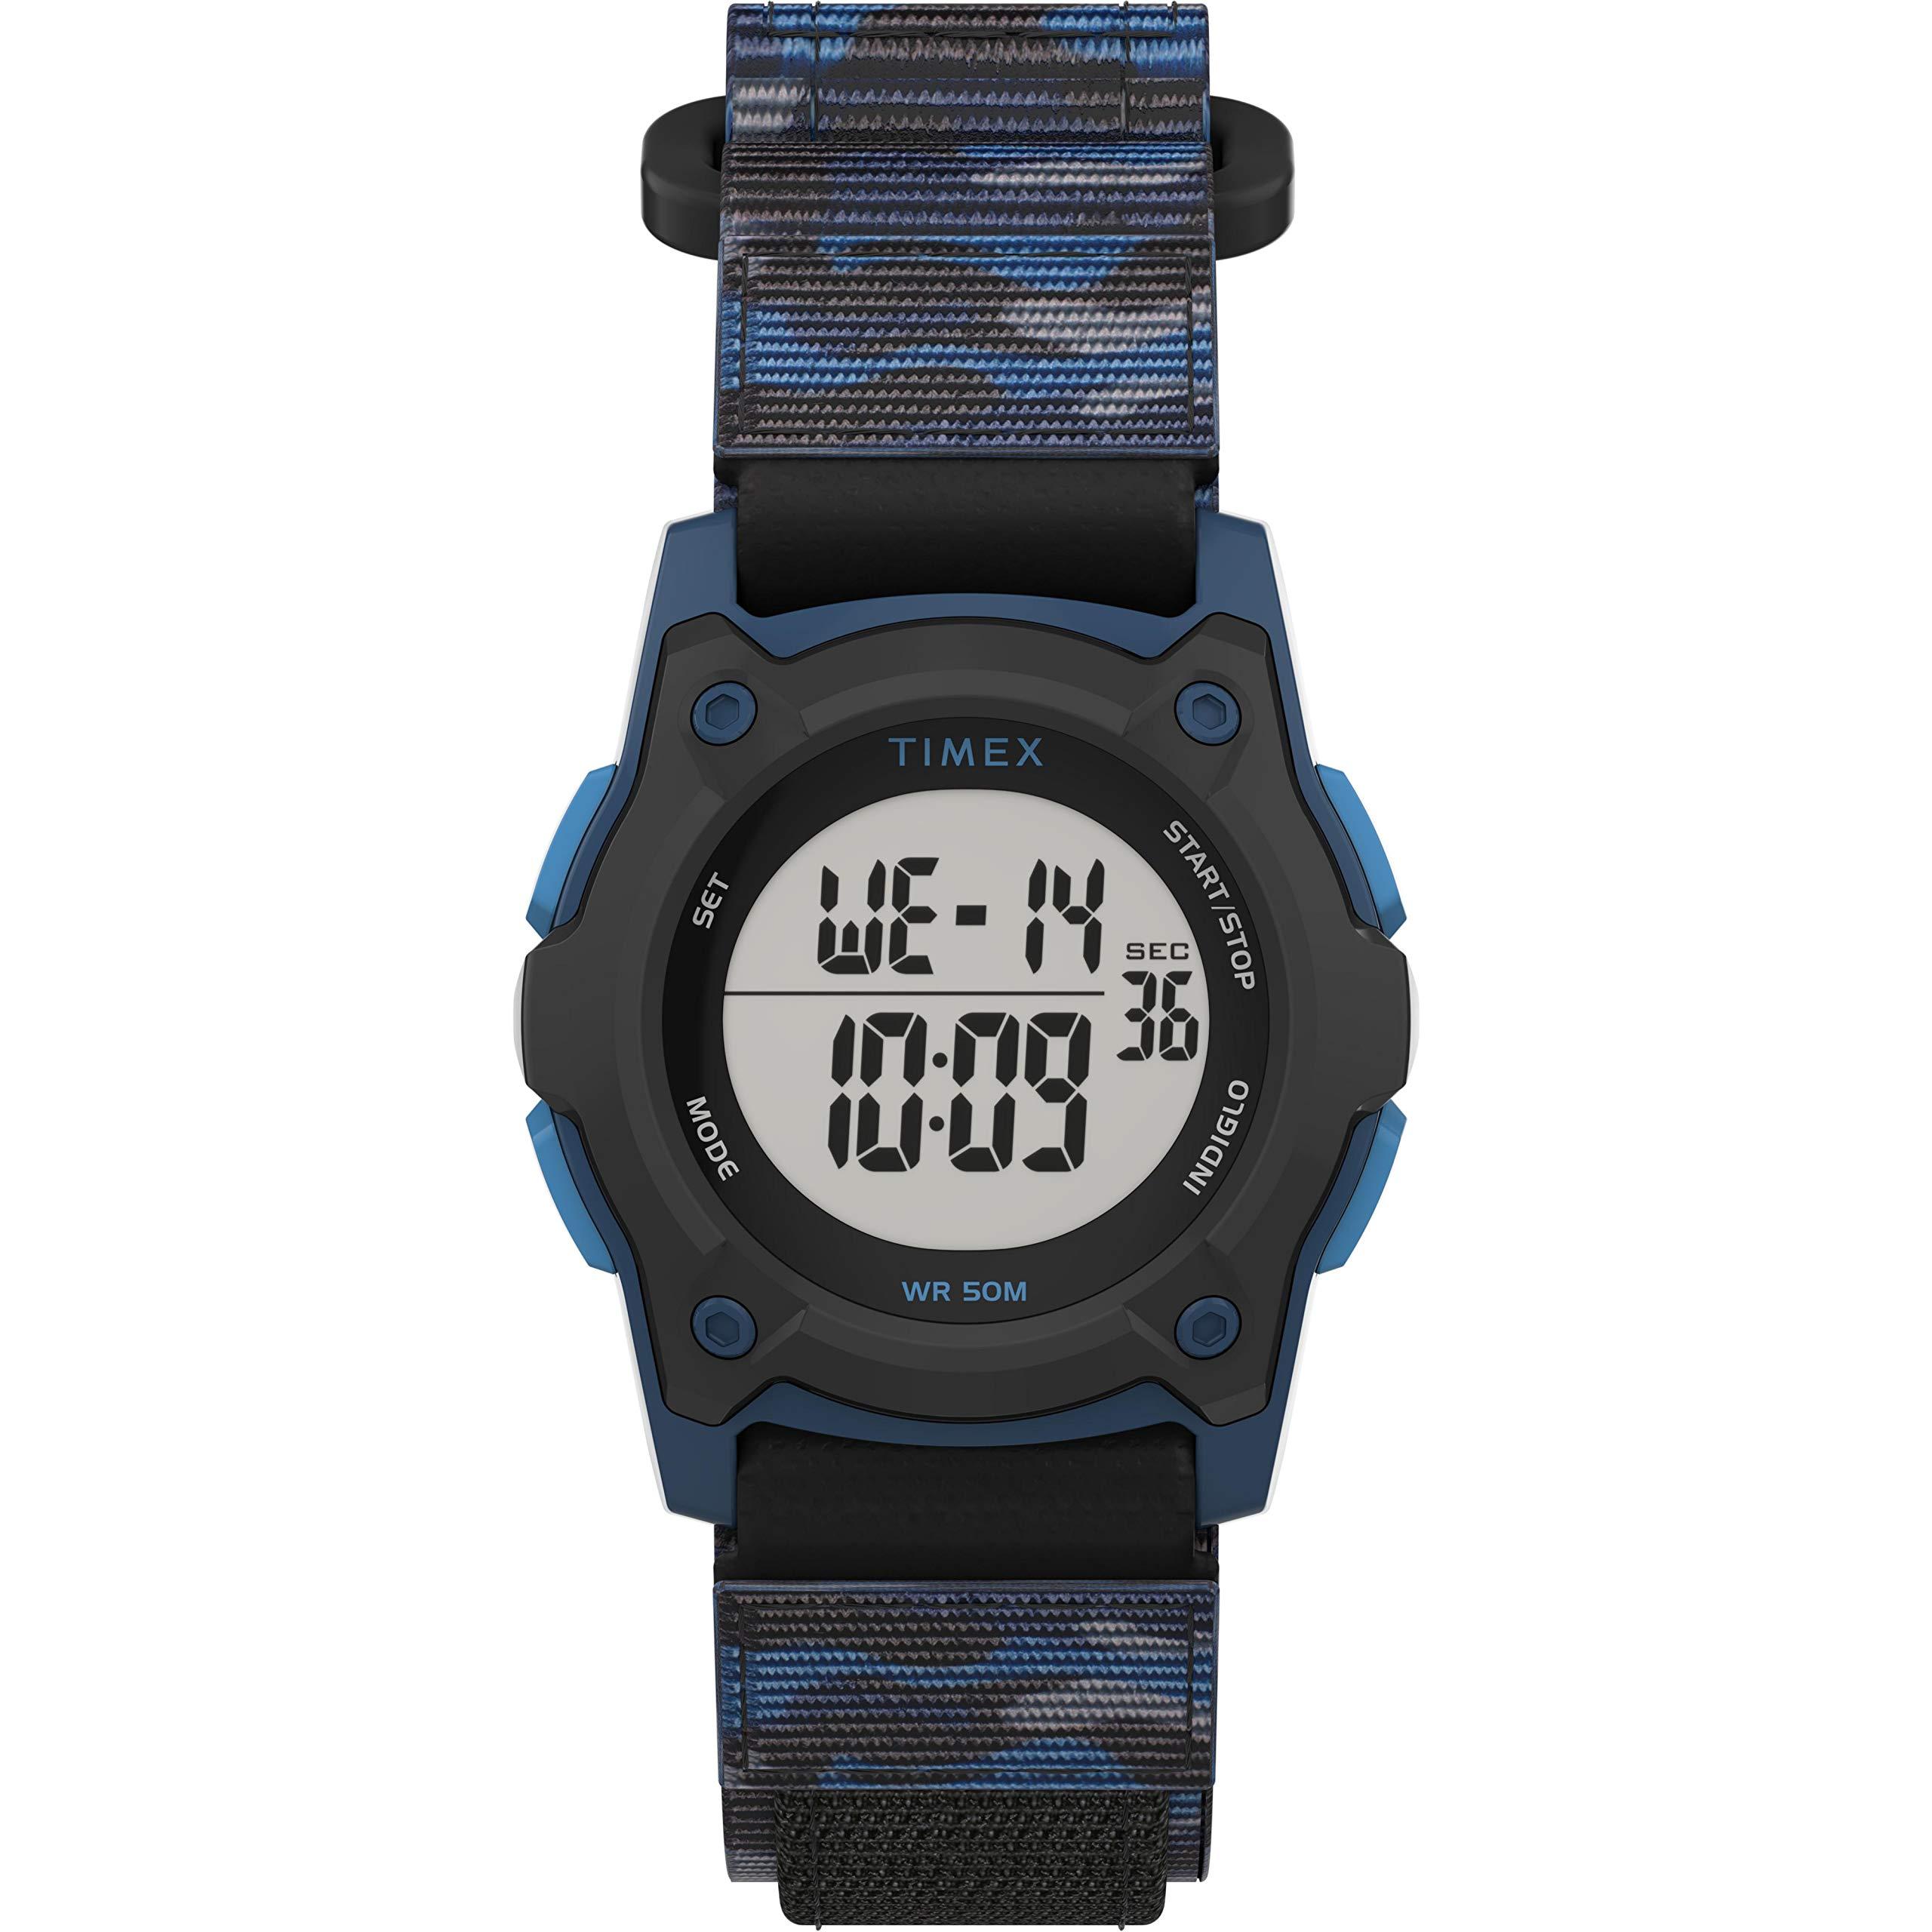 Timex Boys' Time Machines Digital Quartz Nylon Strap, Black, 18 Casual Watch (Model: TW7C774009J) by Timex